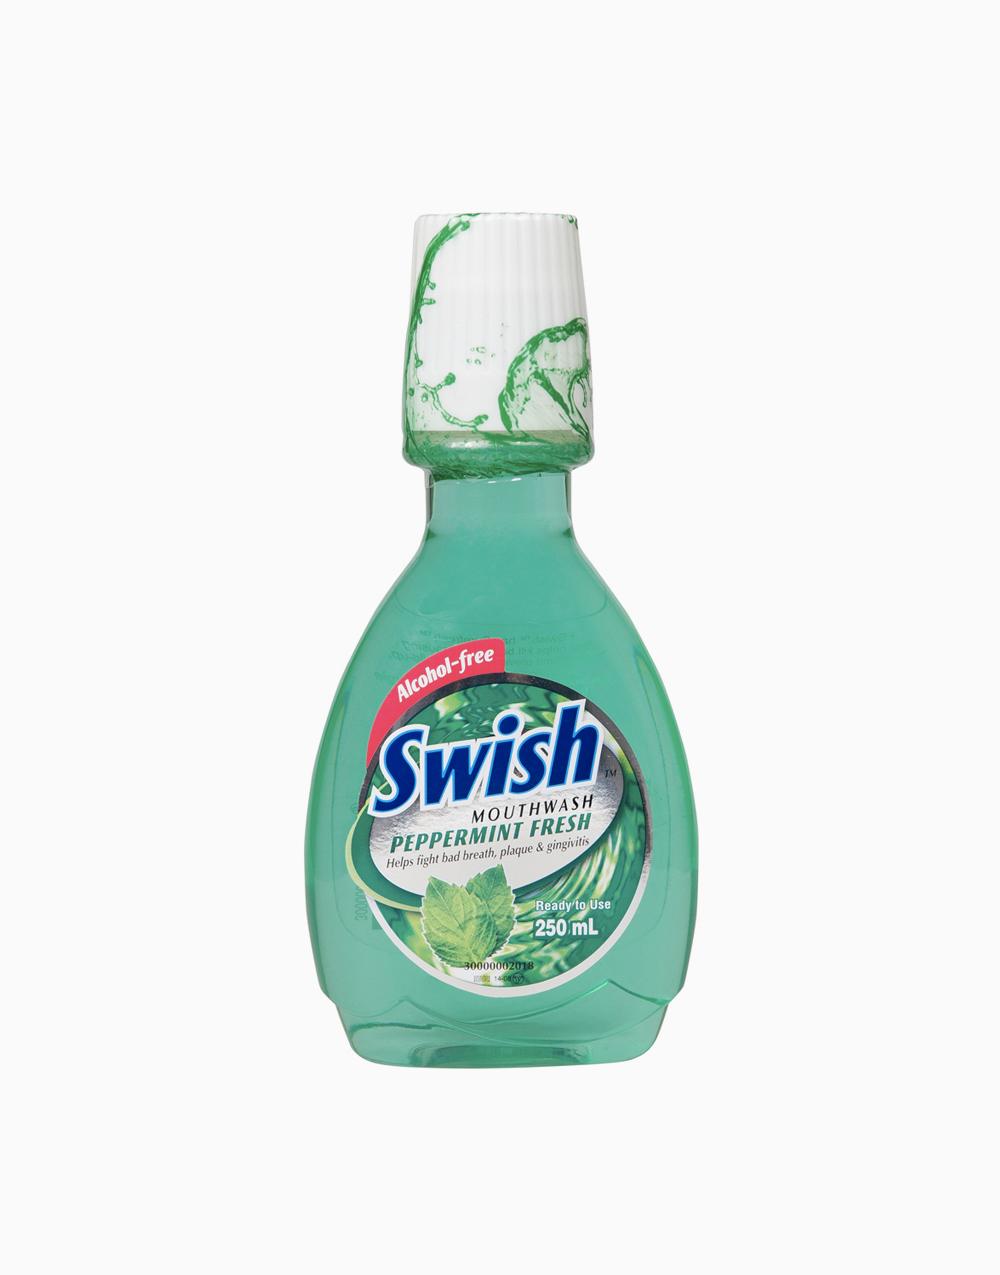 Swish Mouthwash (250ml) by Swish | Peppermint Fresh